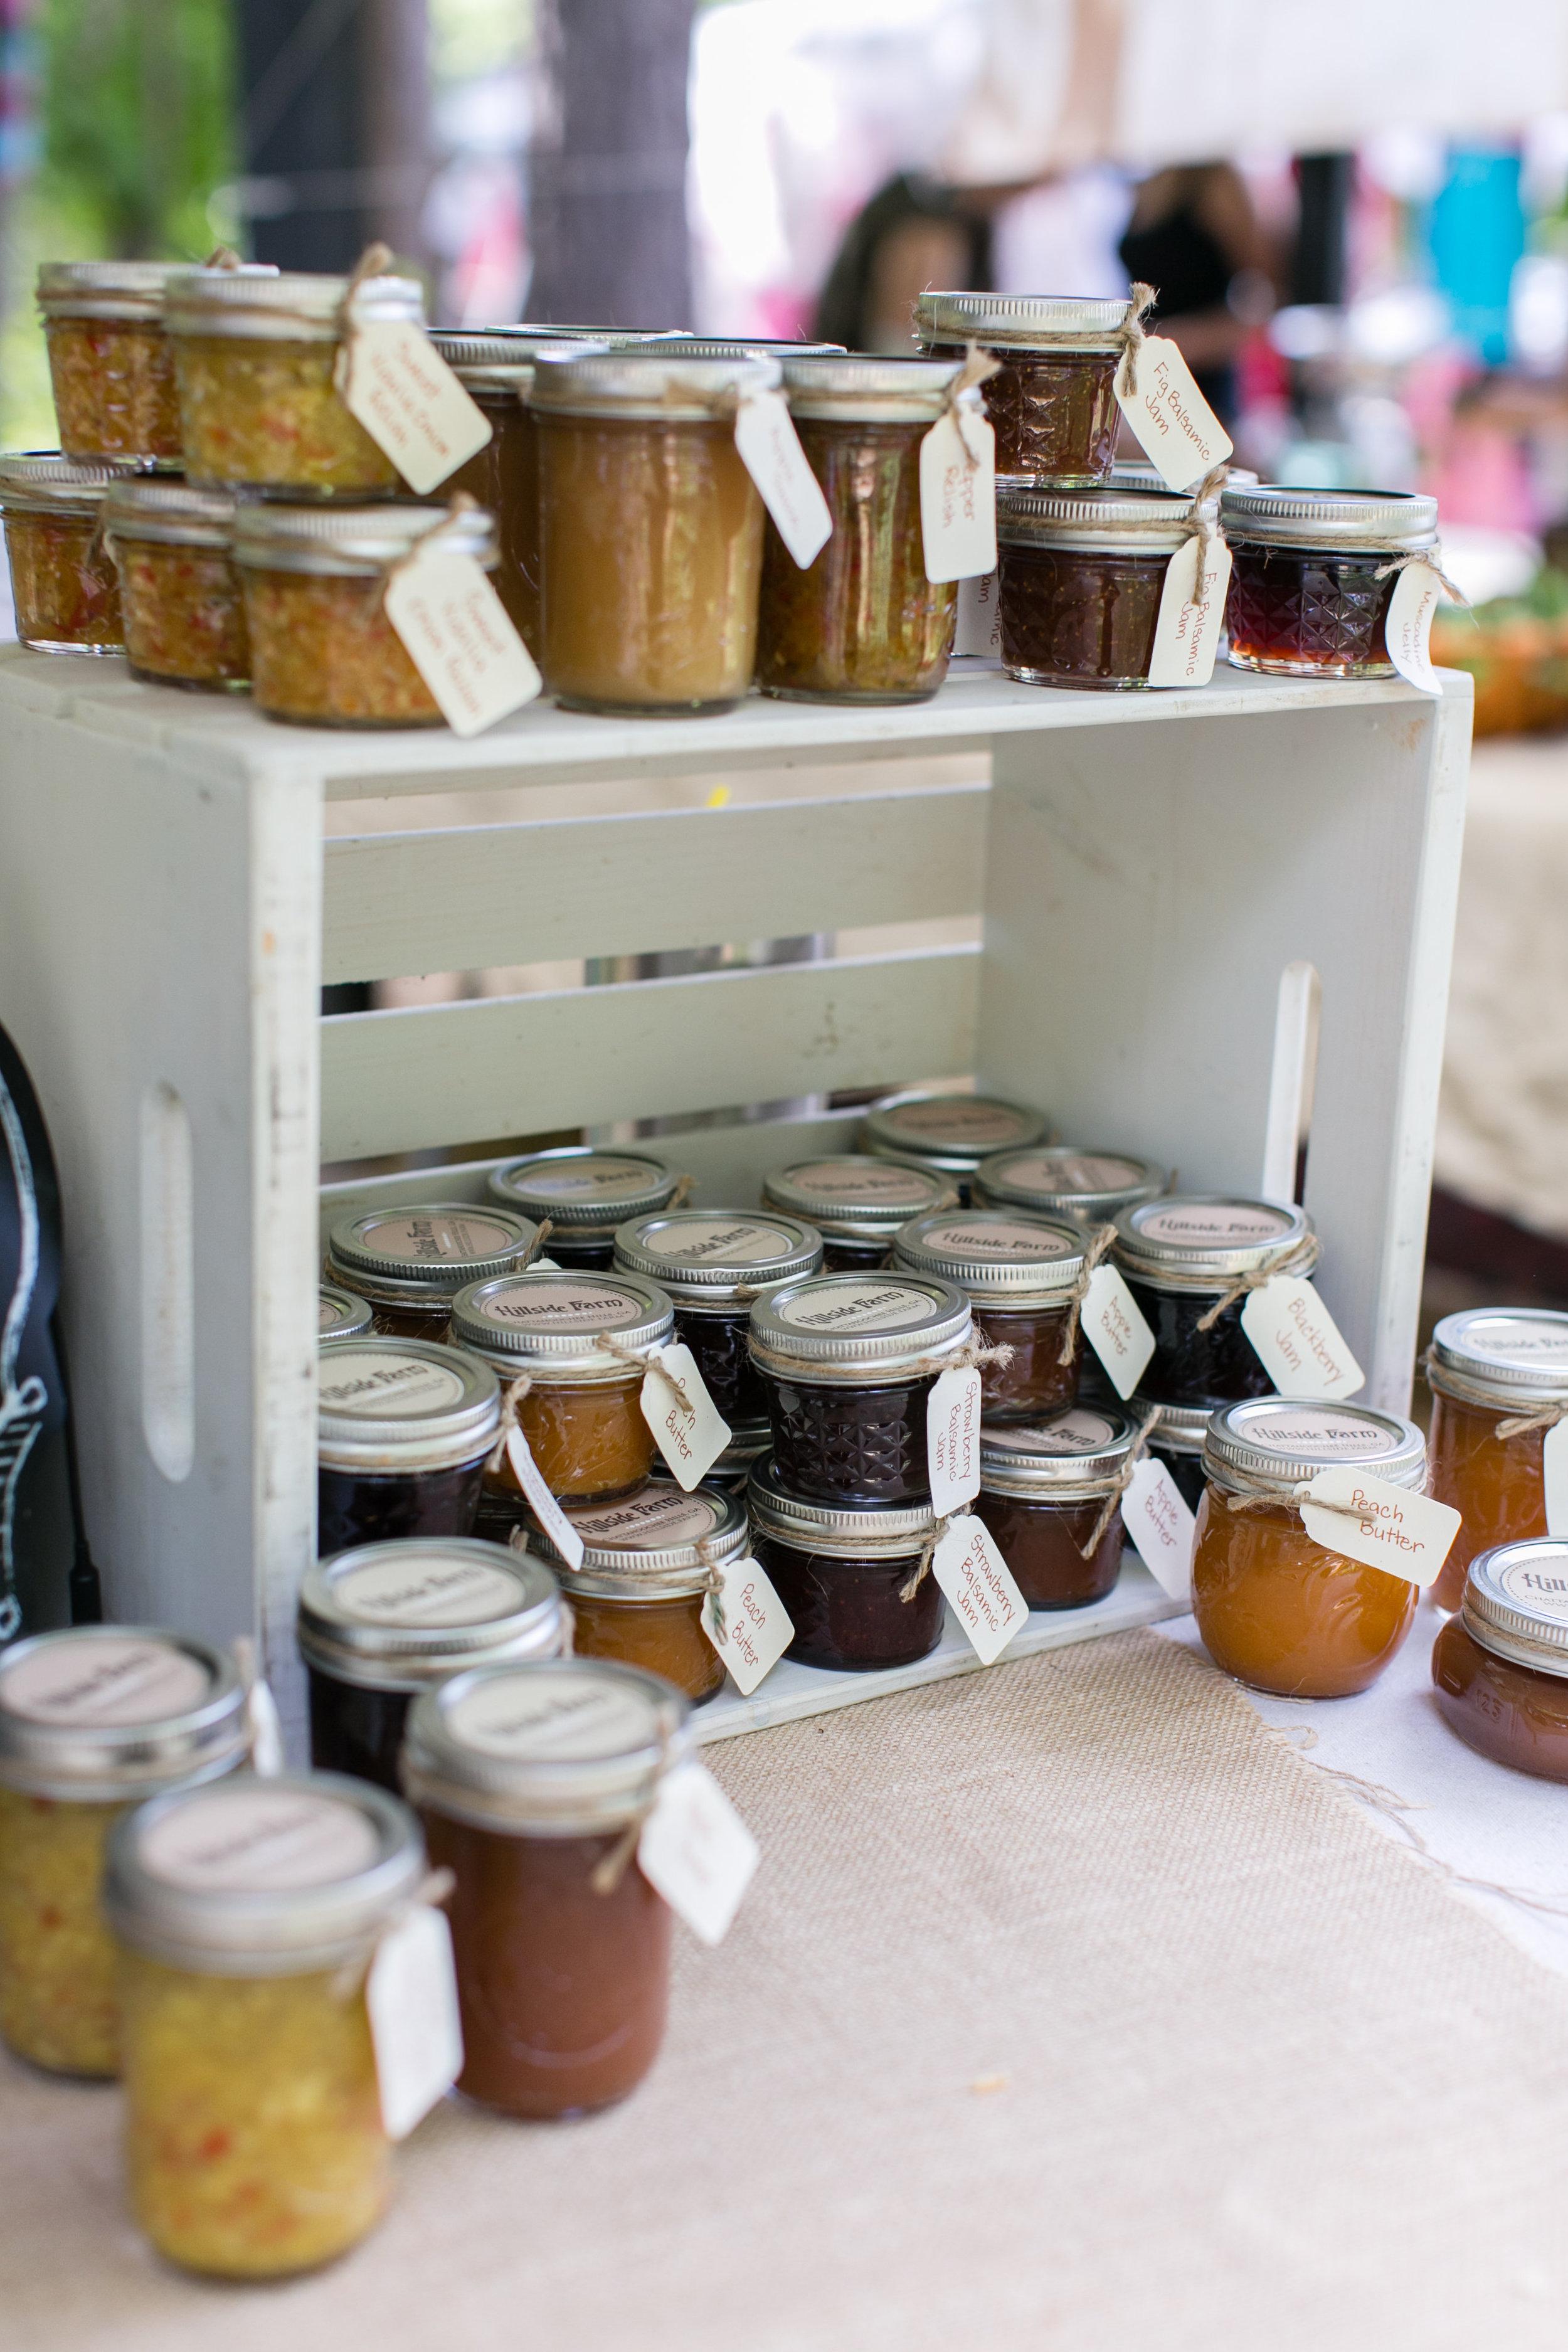 Hillside Farm   Chattahoochee Hills, GA  www.hillside.farm  Locally grown honey, homemade goods, vegetables and fruits